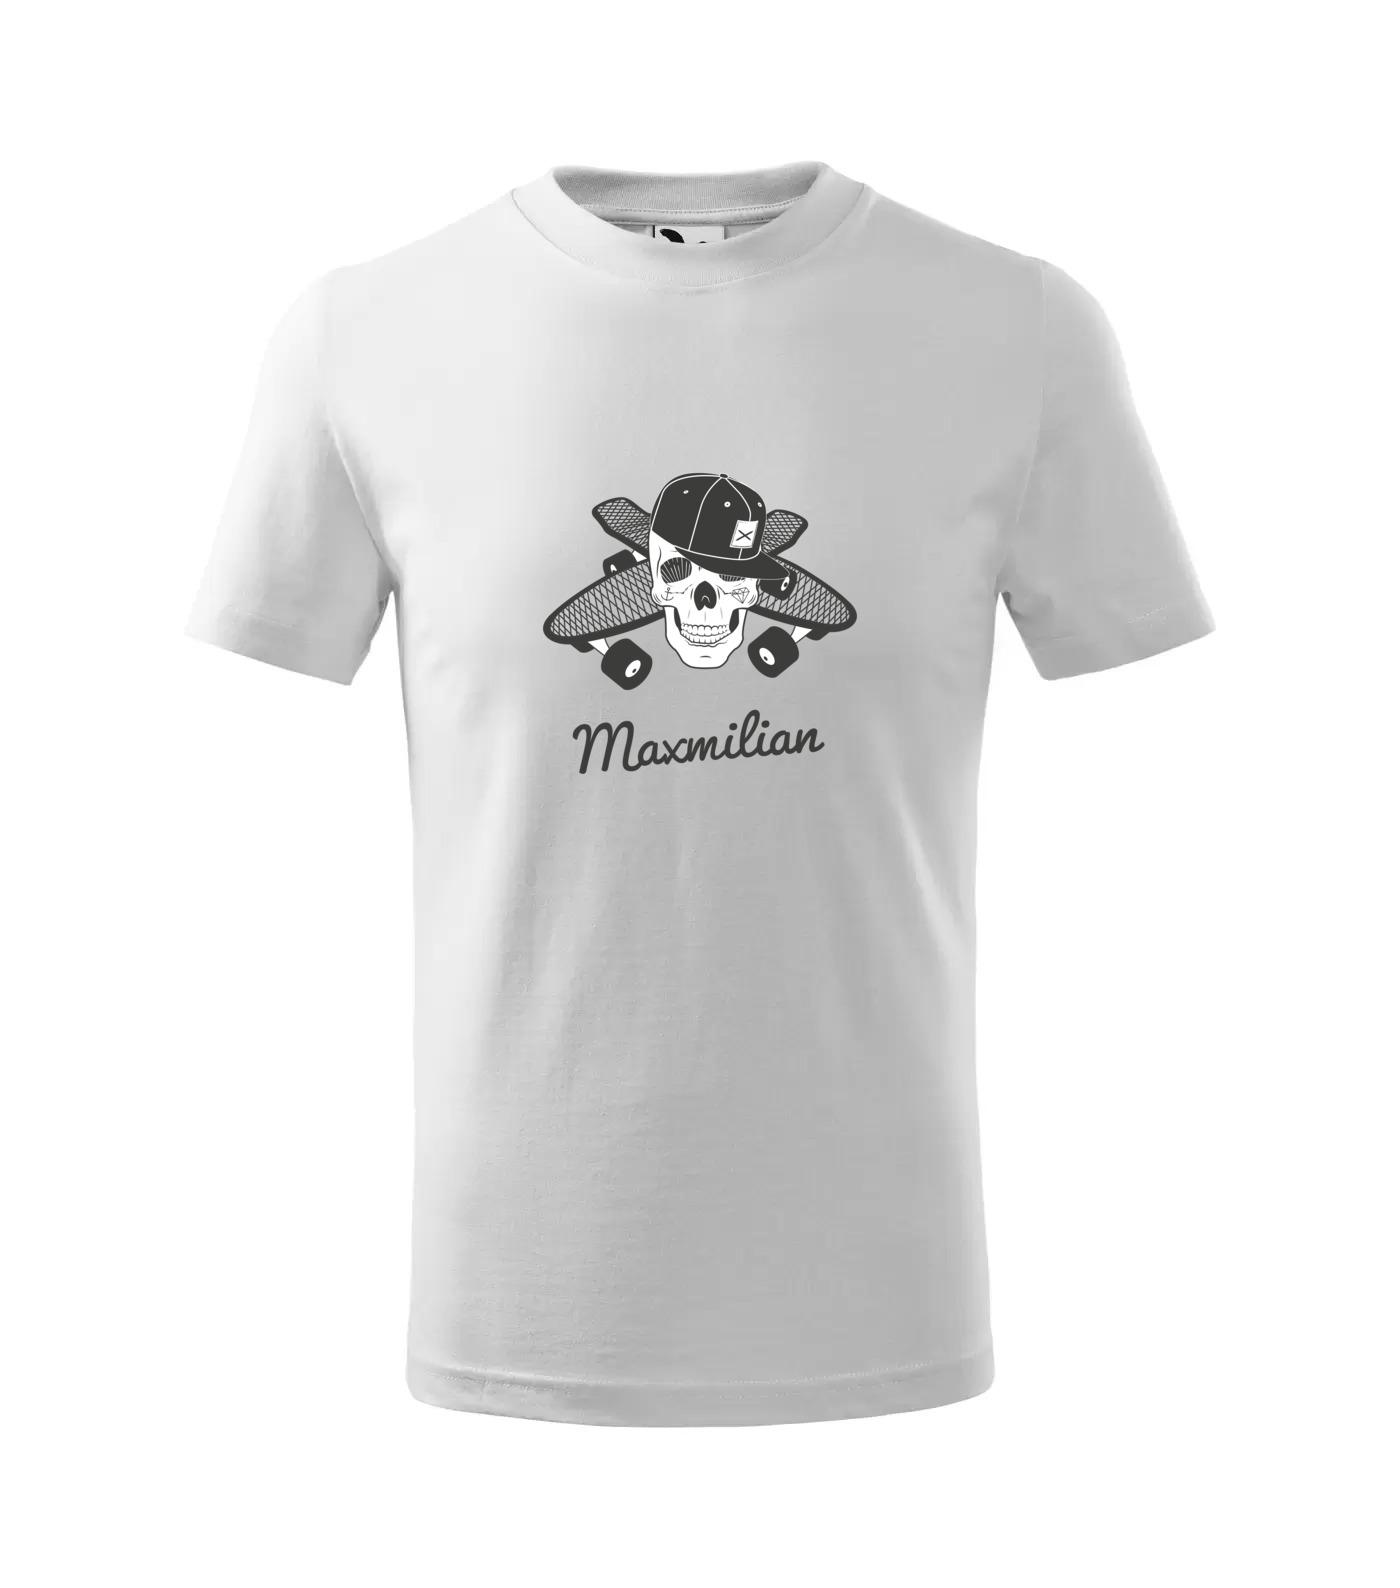 Tričko Skejťák Maxmilian